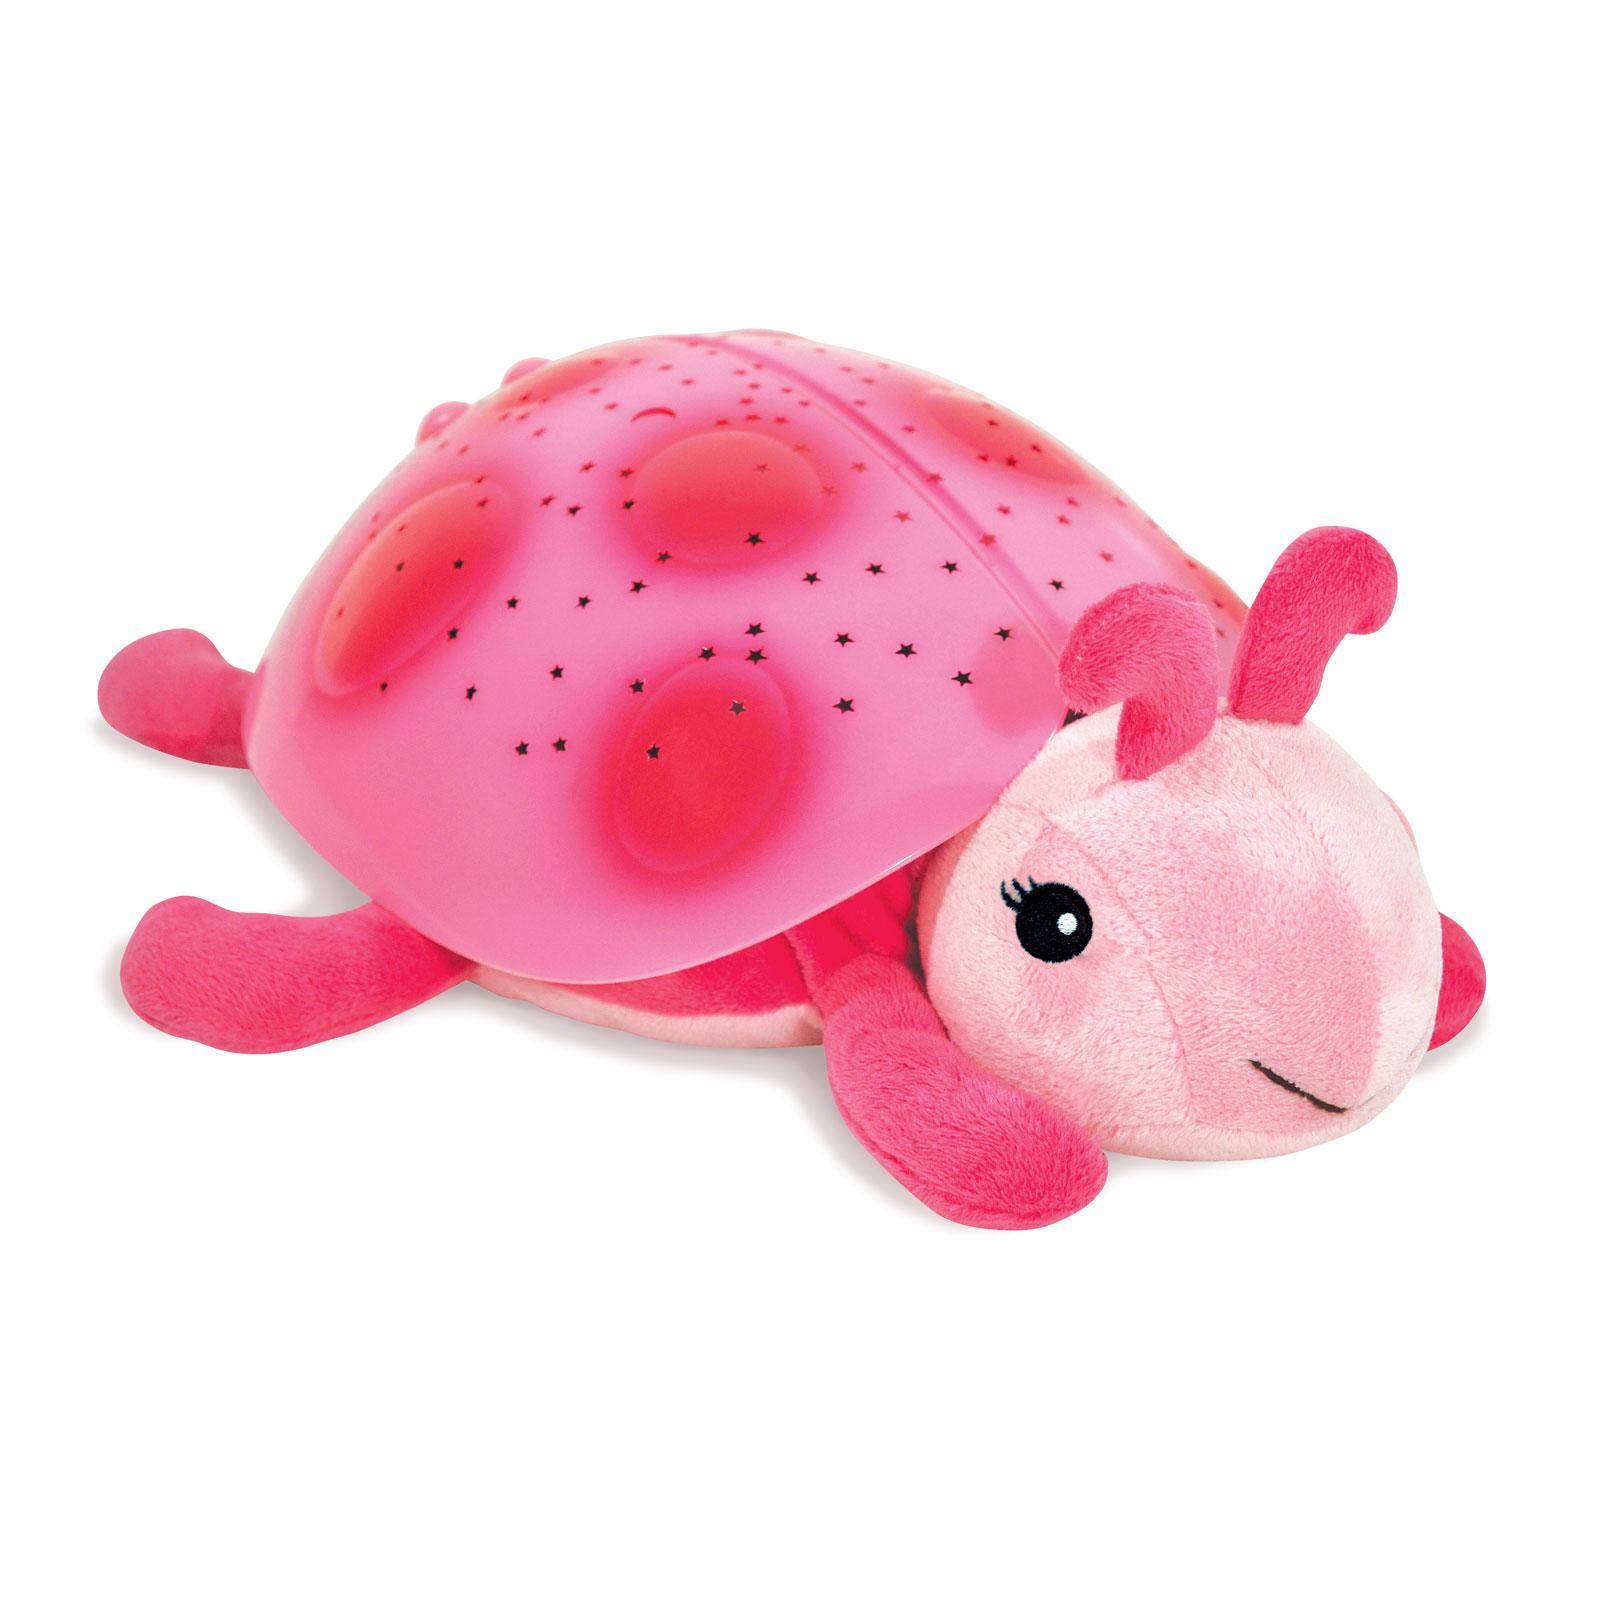 Veilleuse Veilleuse Twilight Ladybug - Pink Veilleuse Twilight Ladybug - Pink